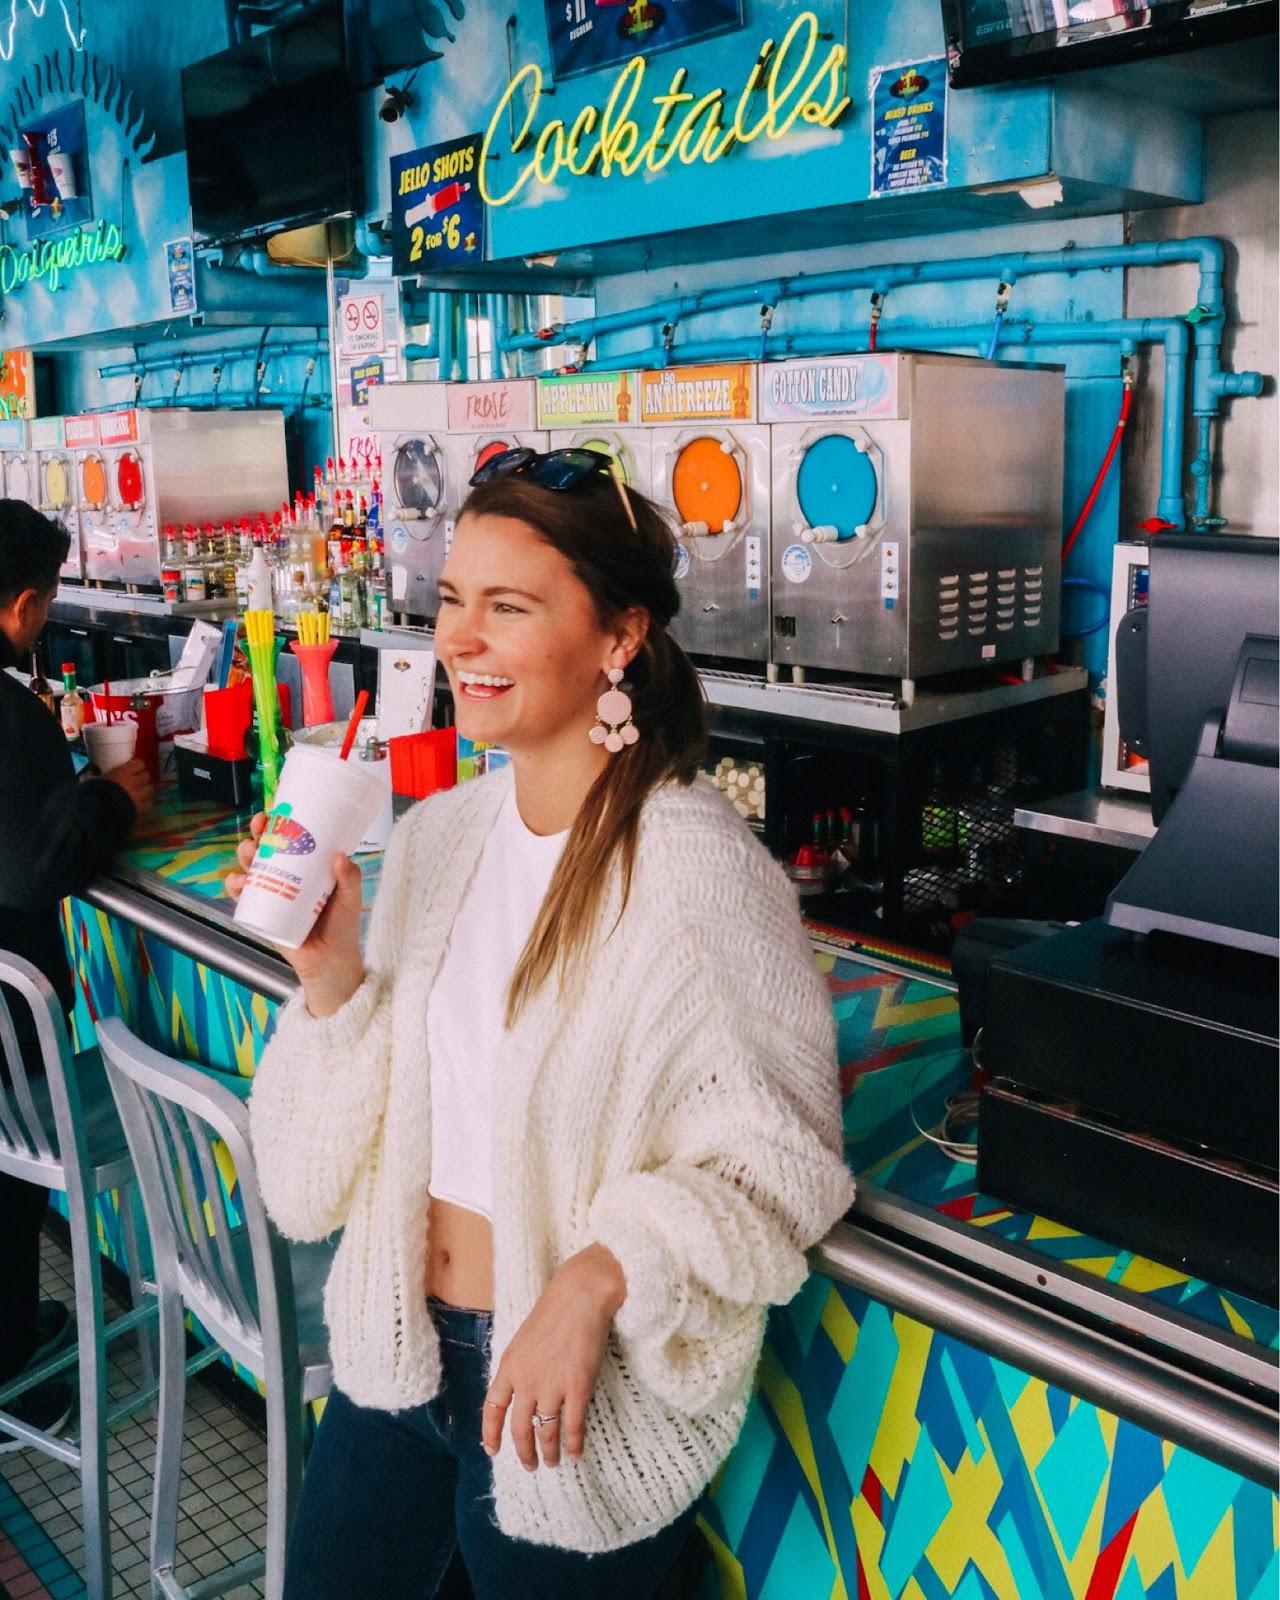 Travel blogger enjoying frozen daiquiris from Big Easy Daiquiris in New Orleans